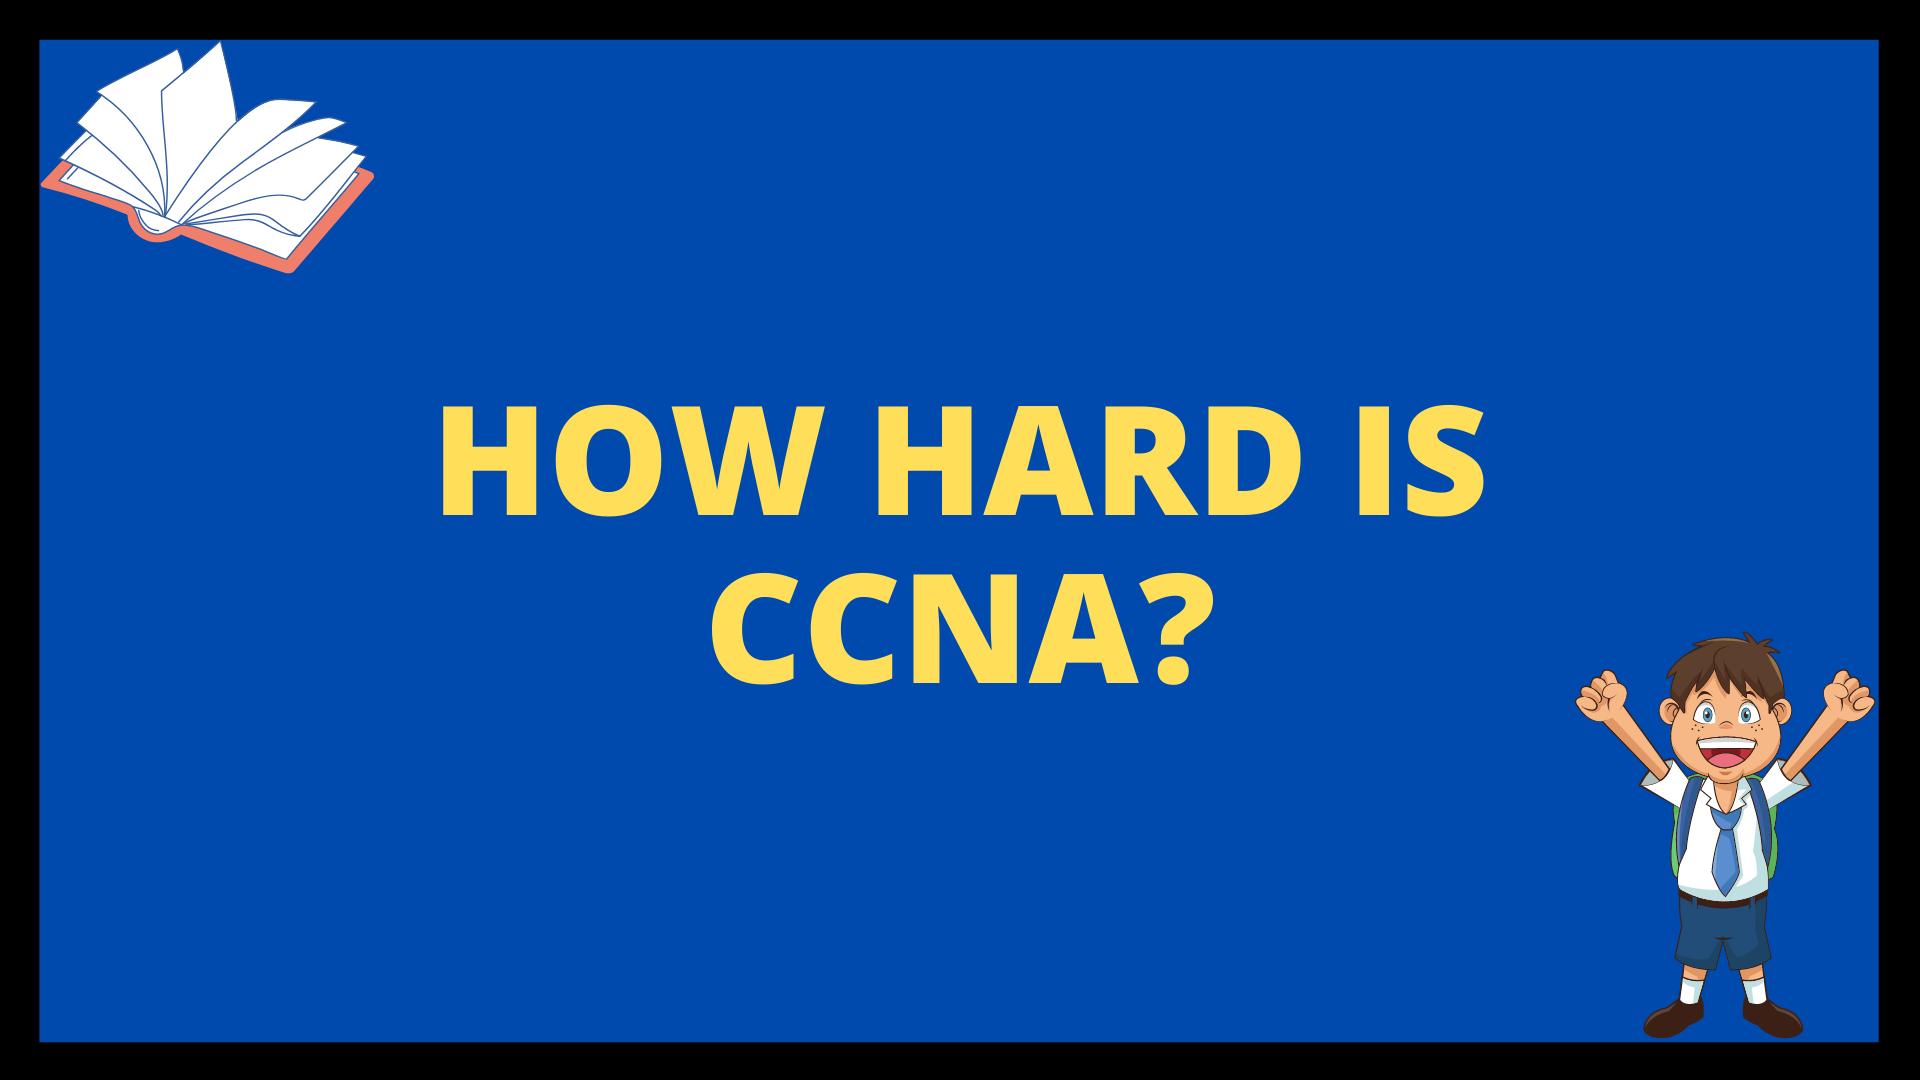 How Hard is CCNA?